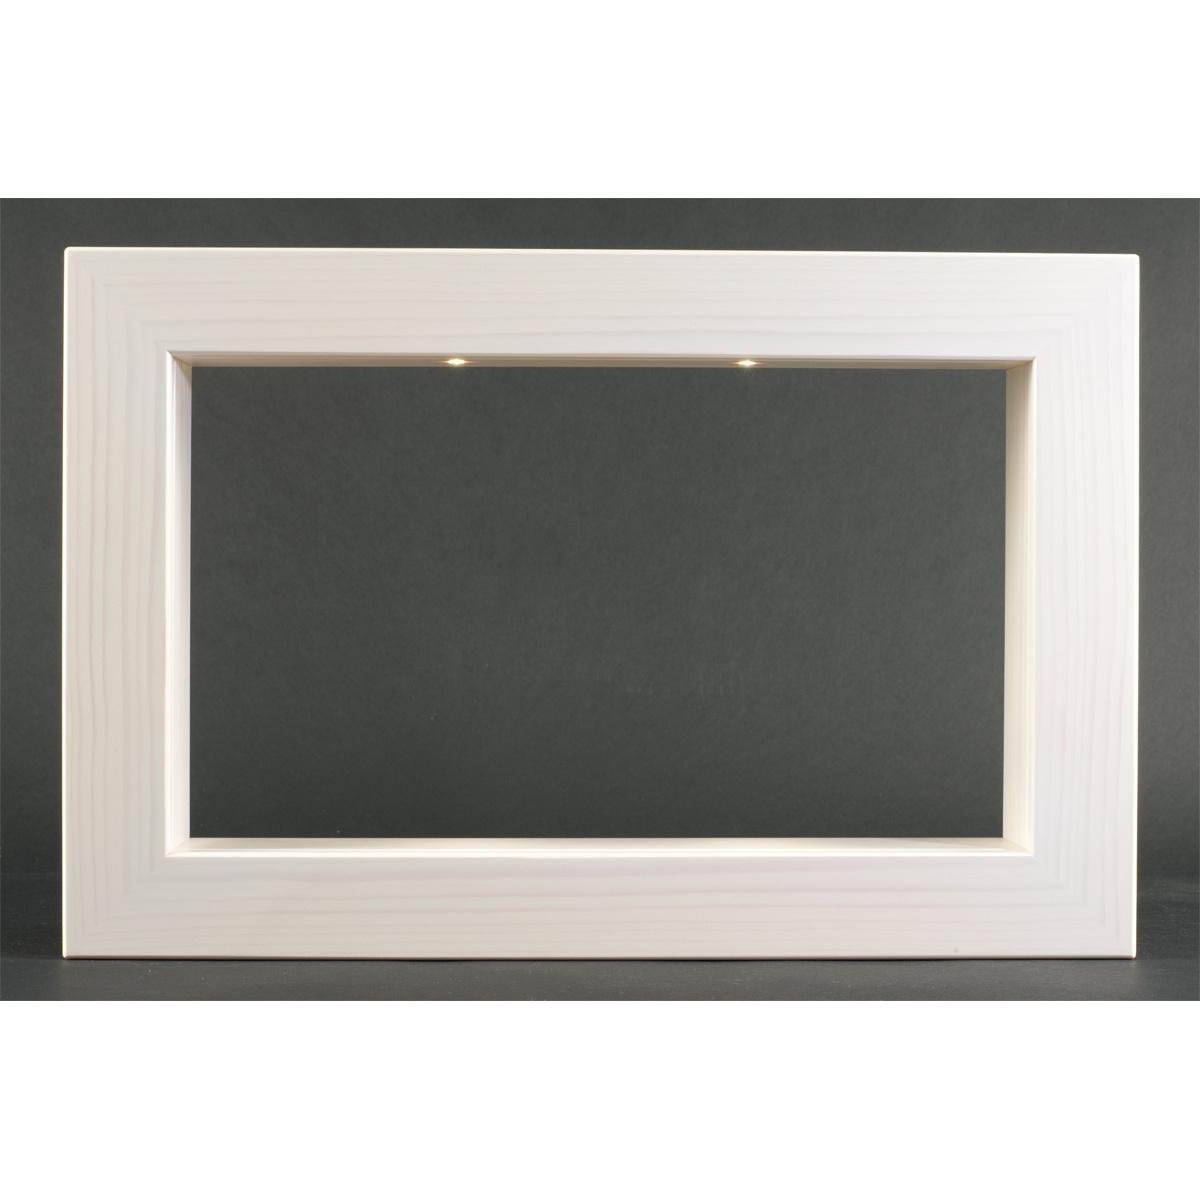 kavex rahmen fichte led beleuchtet gro von n umanns f r kaufen. Black Bedroom Furniture Sets. Home Design Ideas